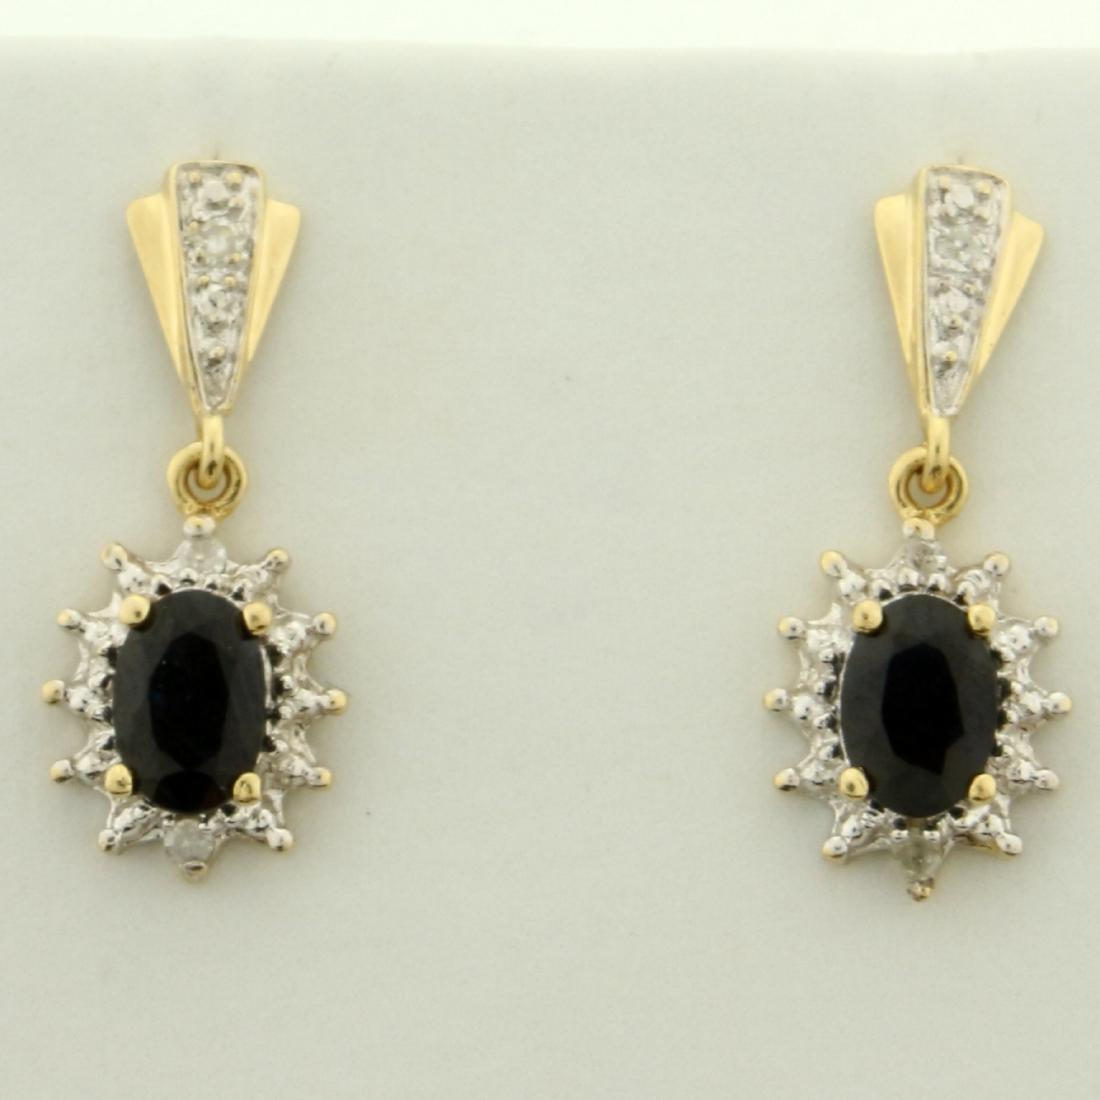 1ct TW Sapphire and Diamond Dangle Earrings in 14K